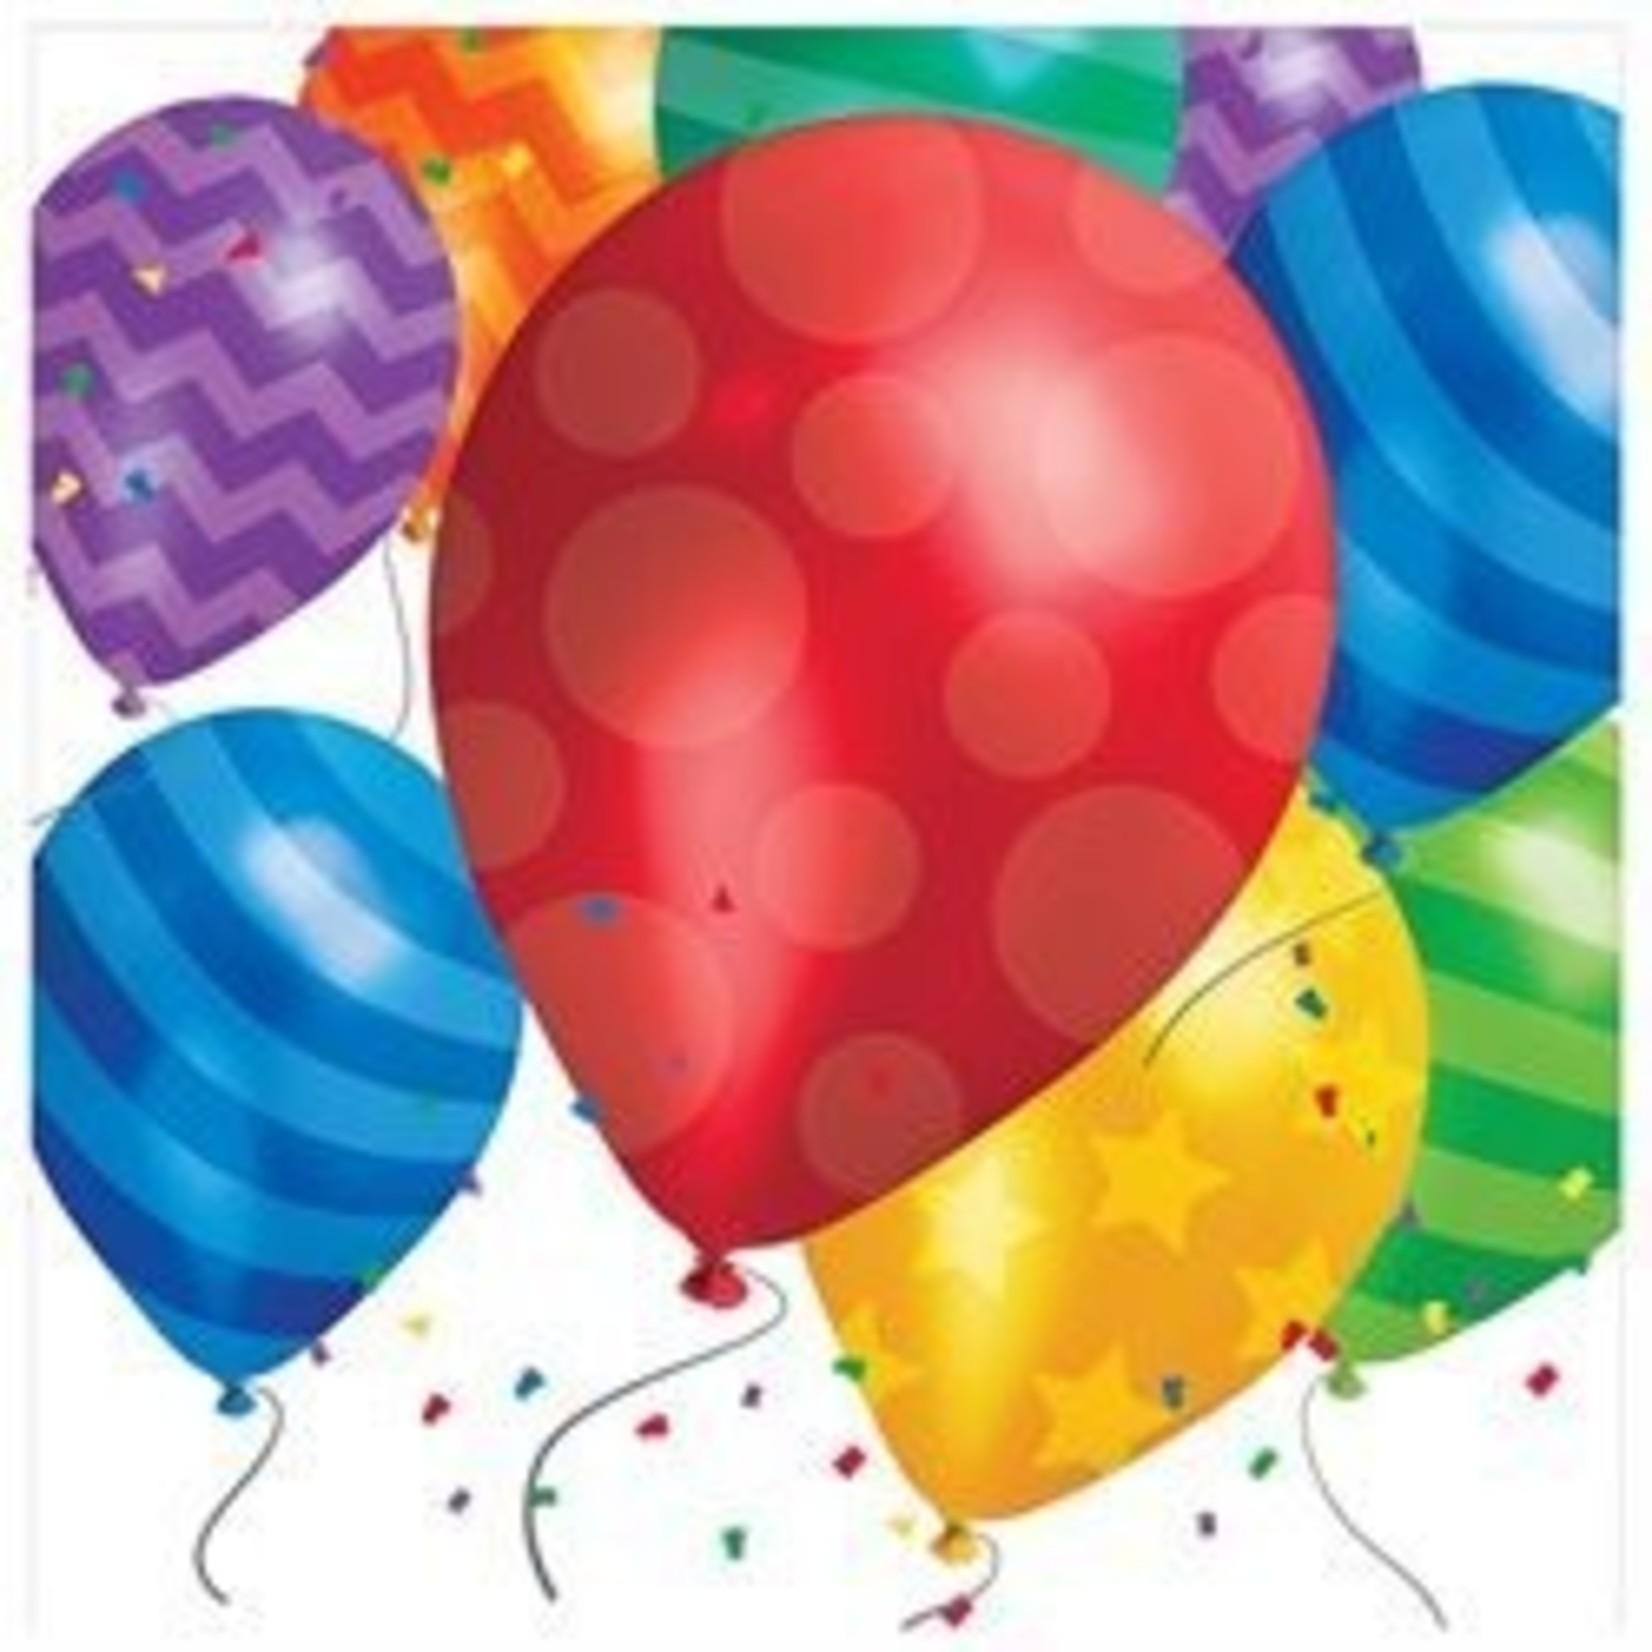 Napkins - LN - Balloon Blast - 16pkg - 2ply